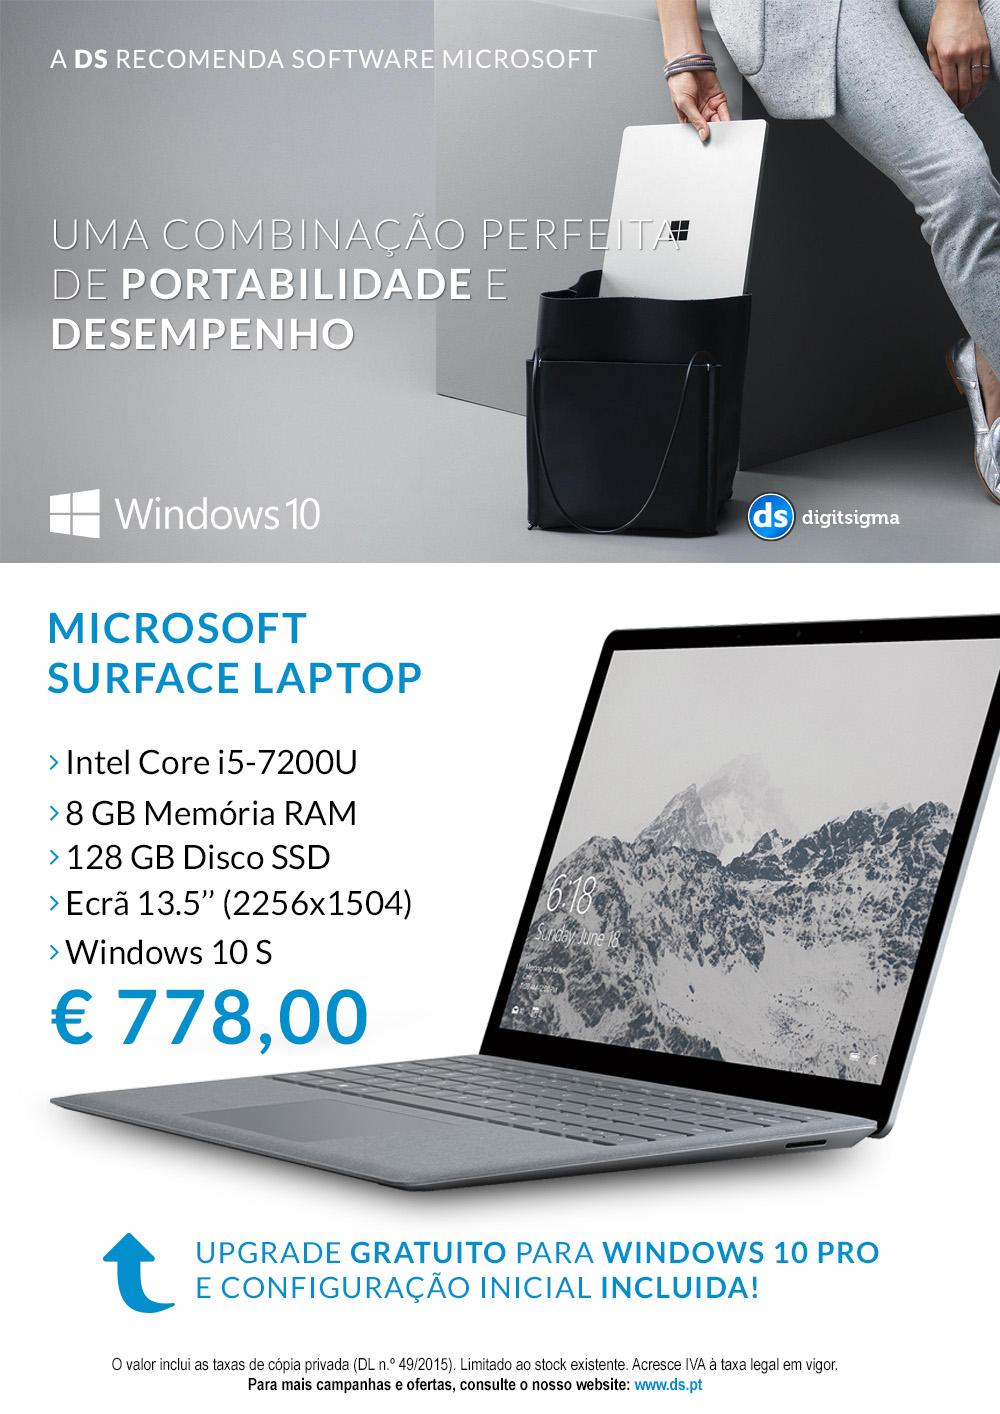 Microsoft Surface Laptop em campanha